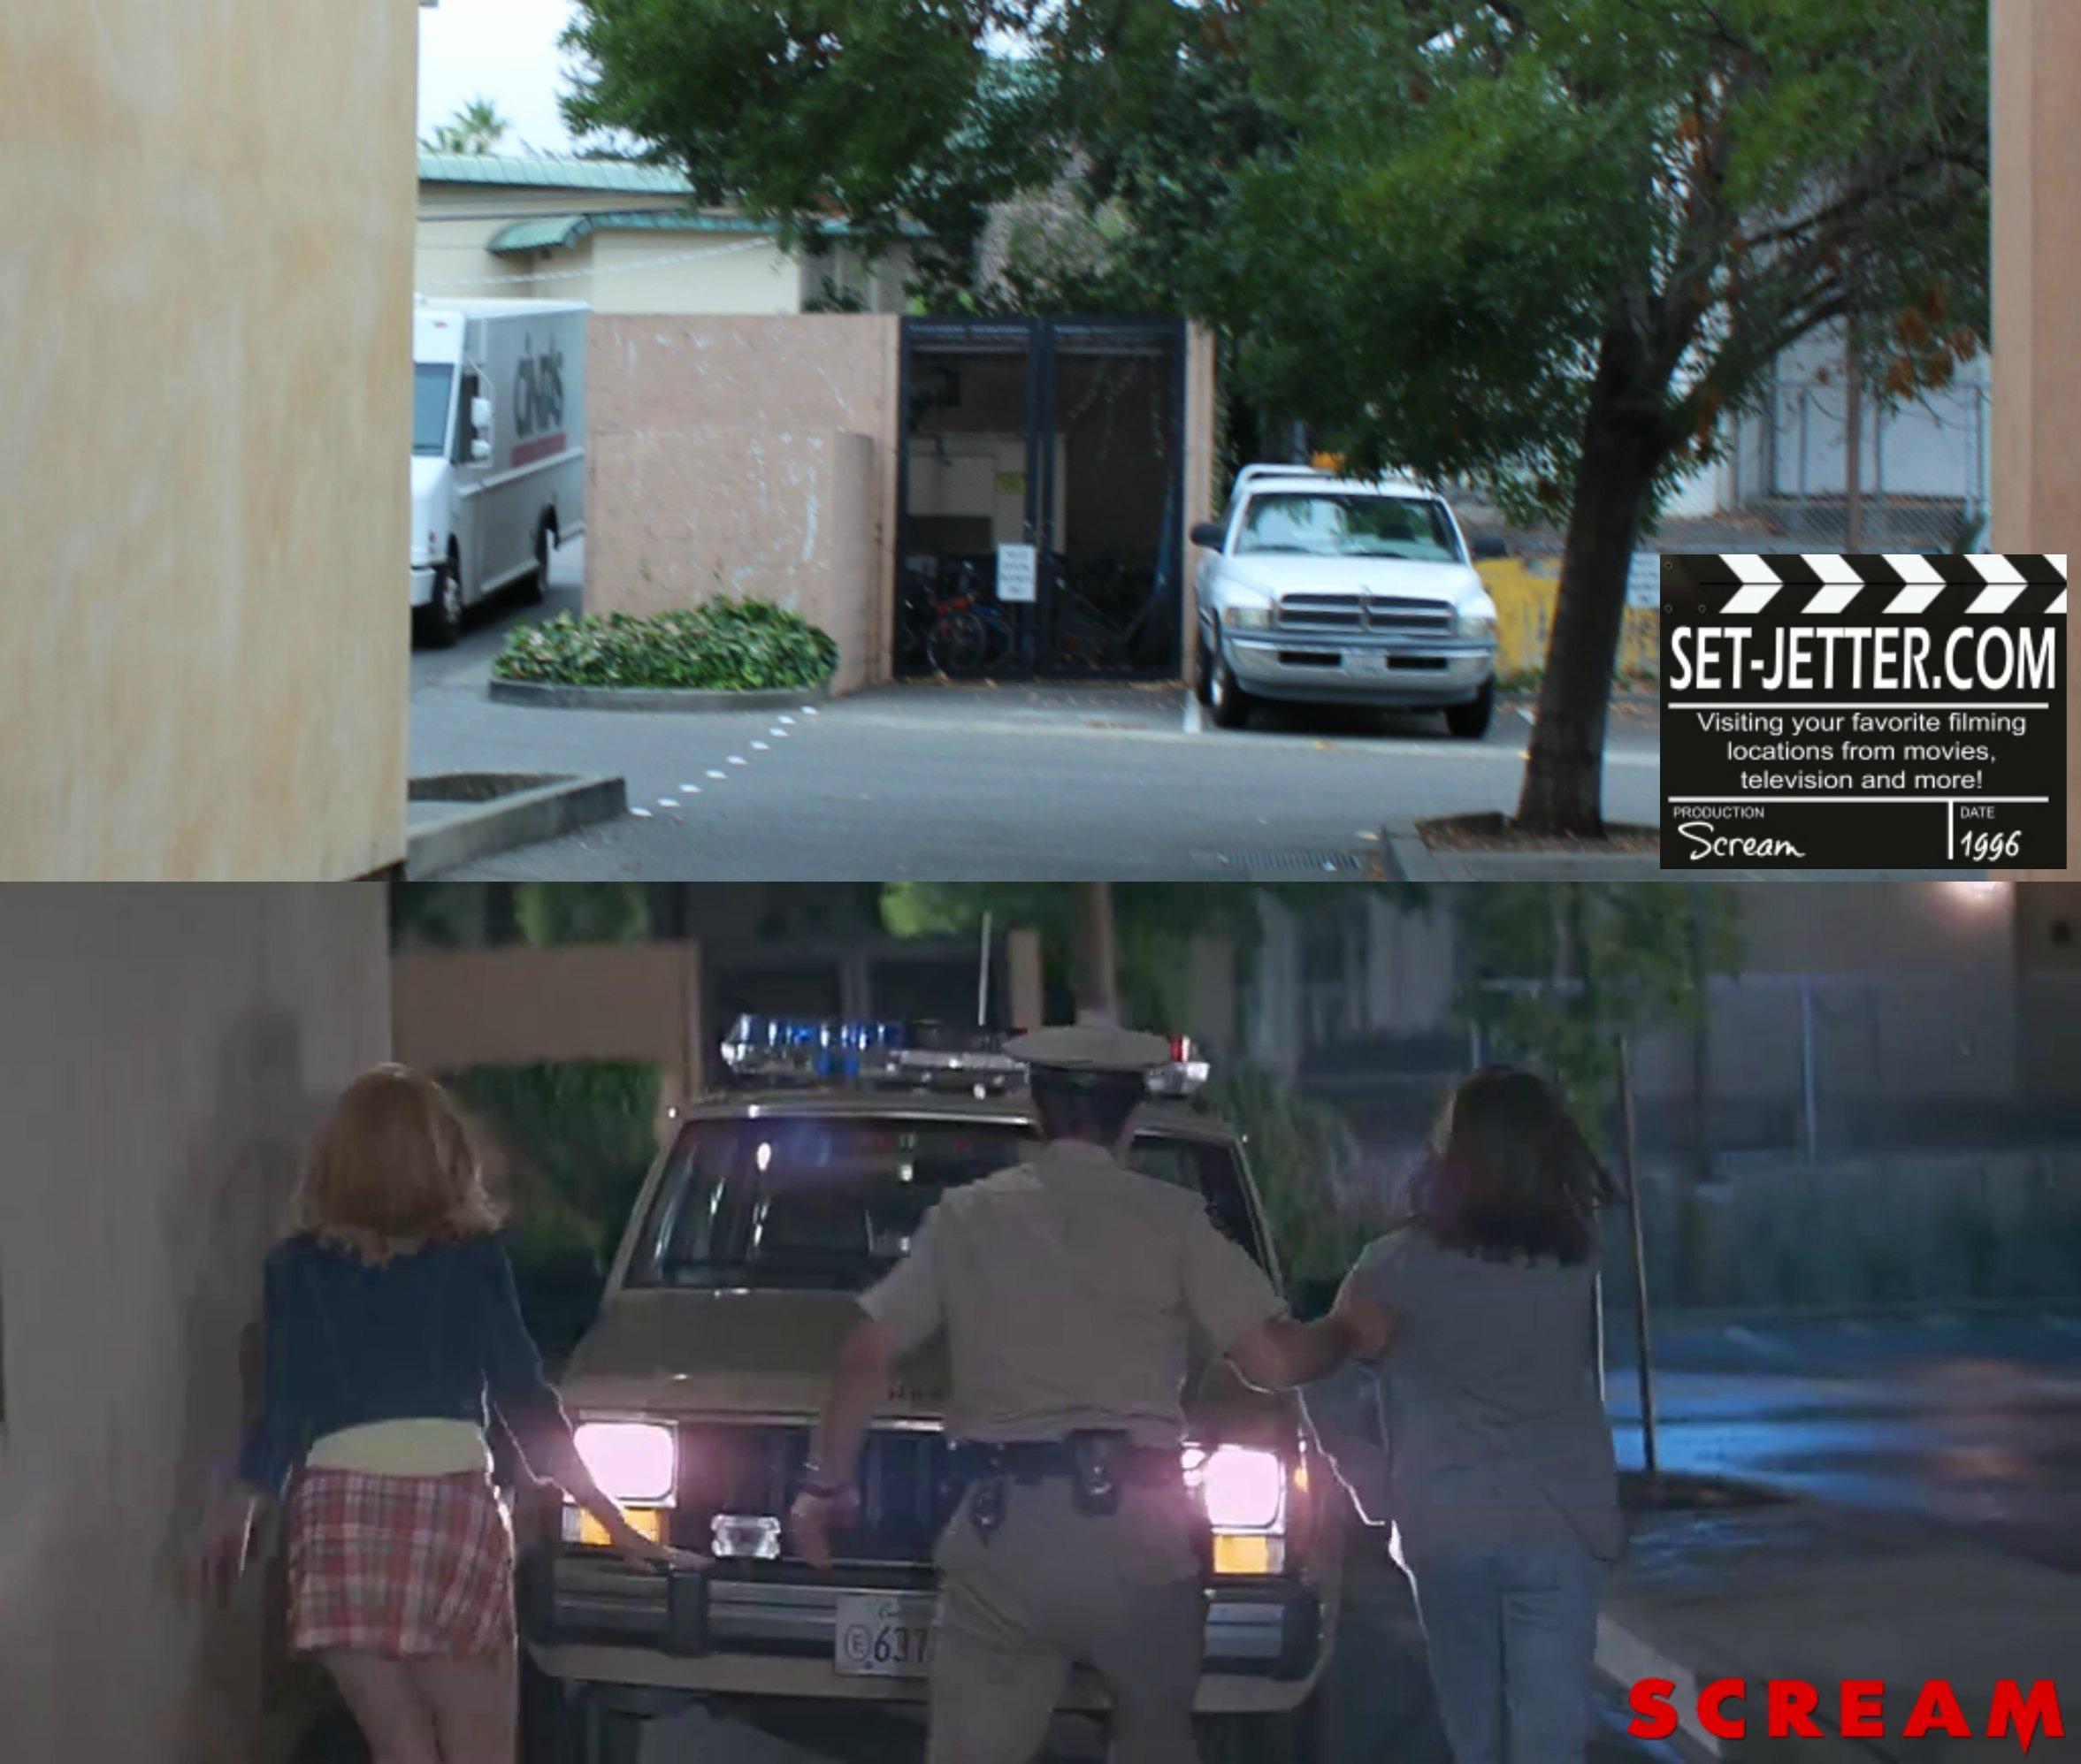 Scream comparison 68.jpg